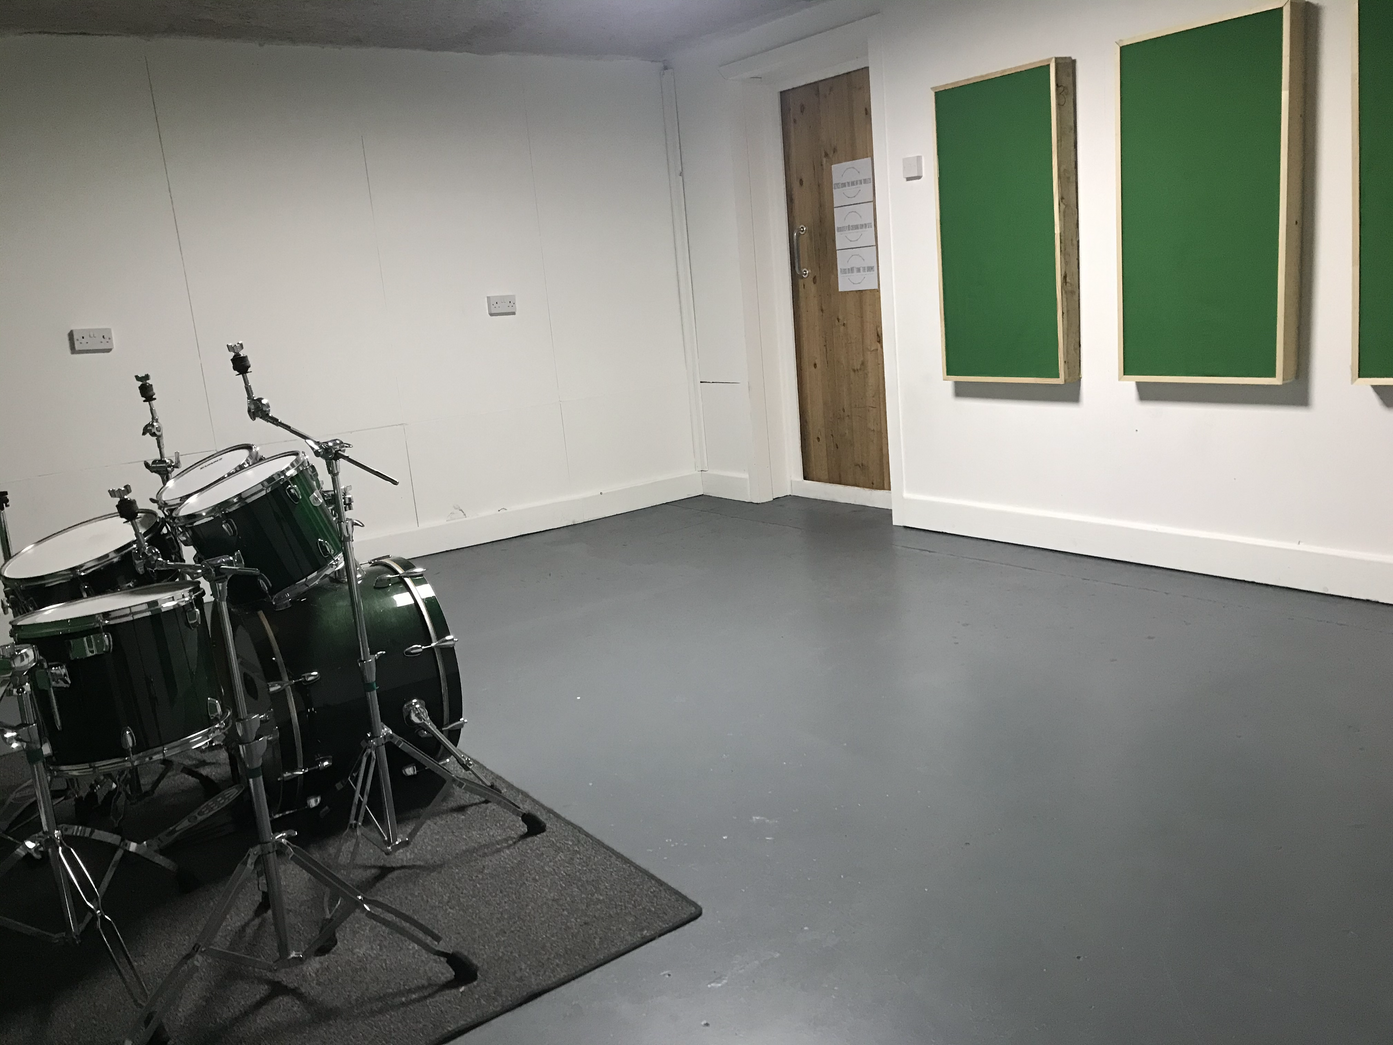 Green Room B